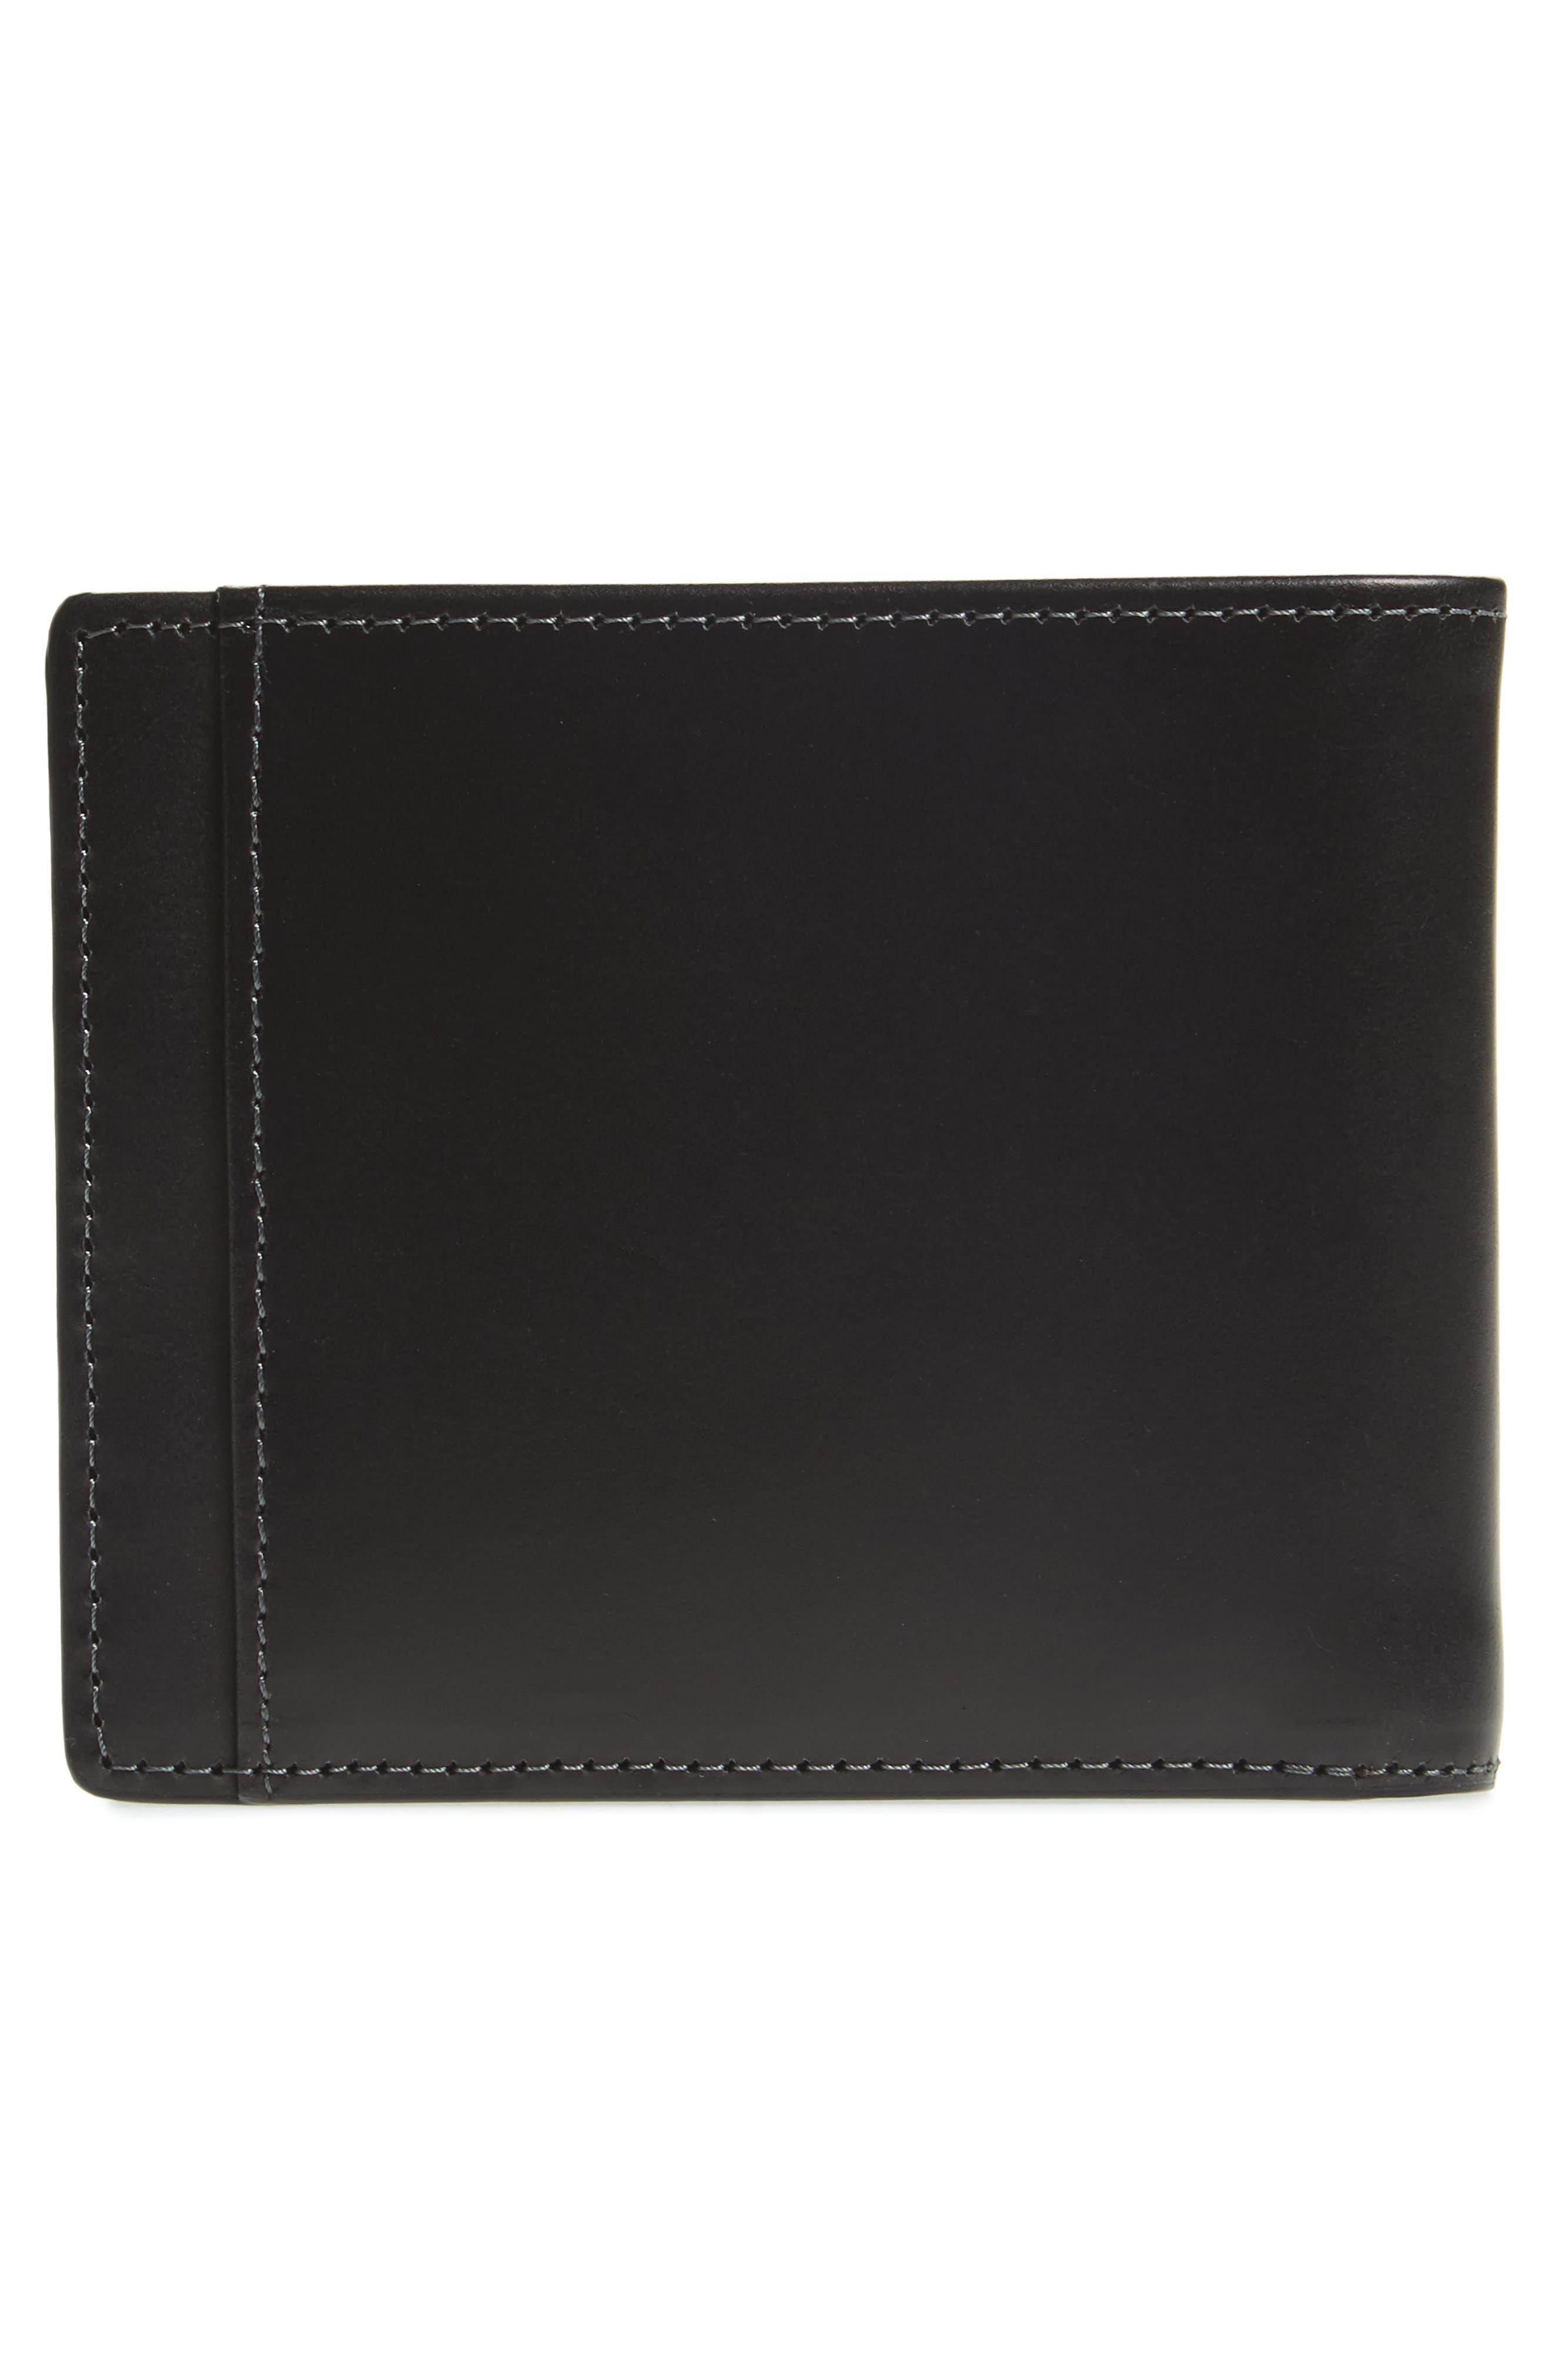 Wyatt RFID Leather Wallet,                             Alternate thumbnail 3, color,                             BLACK